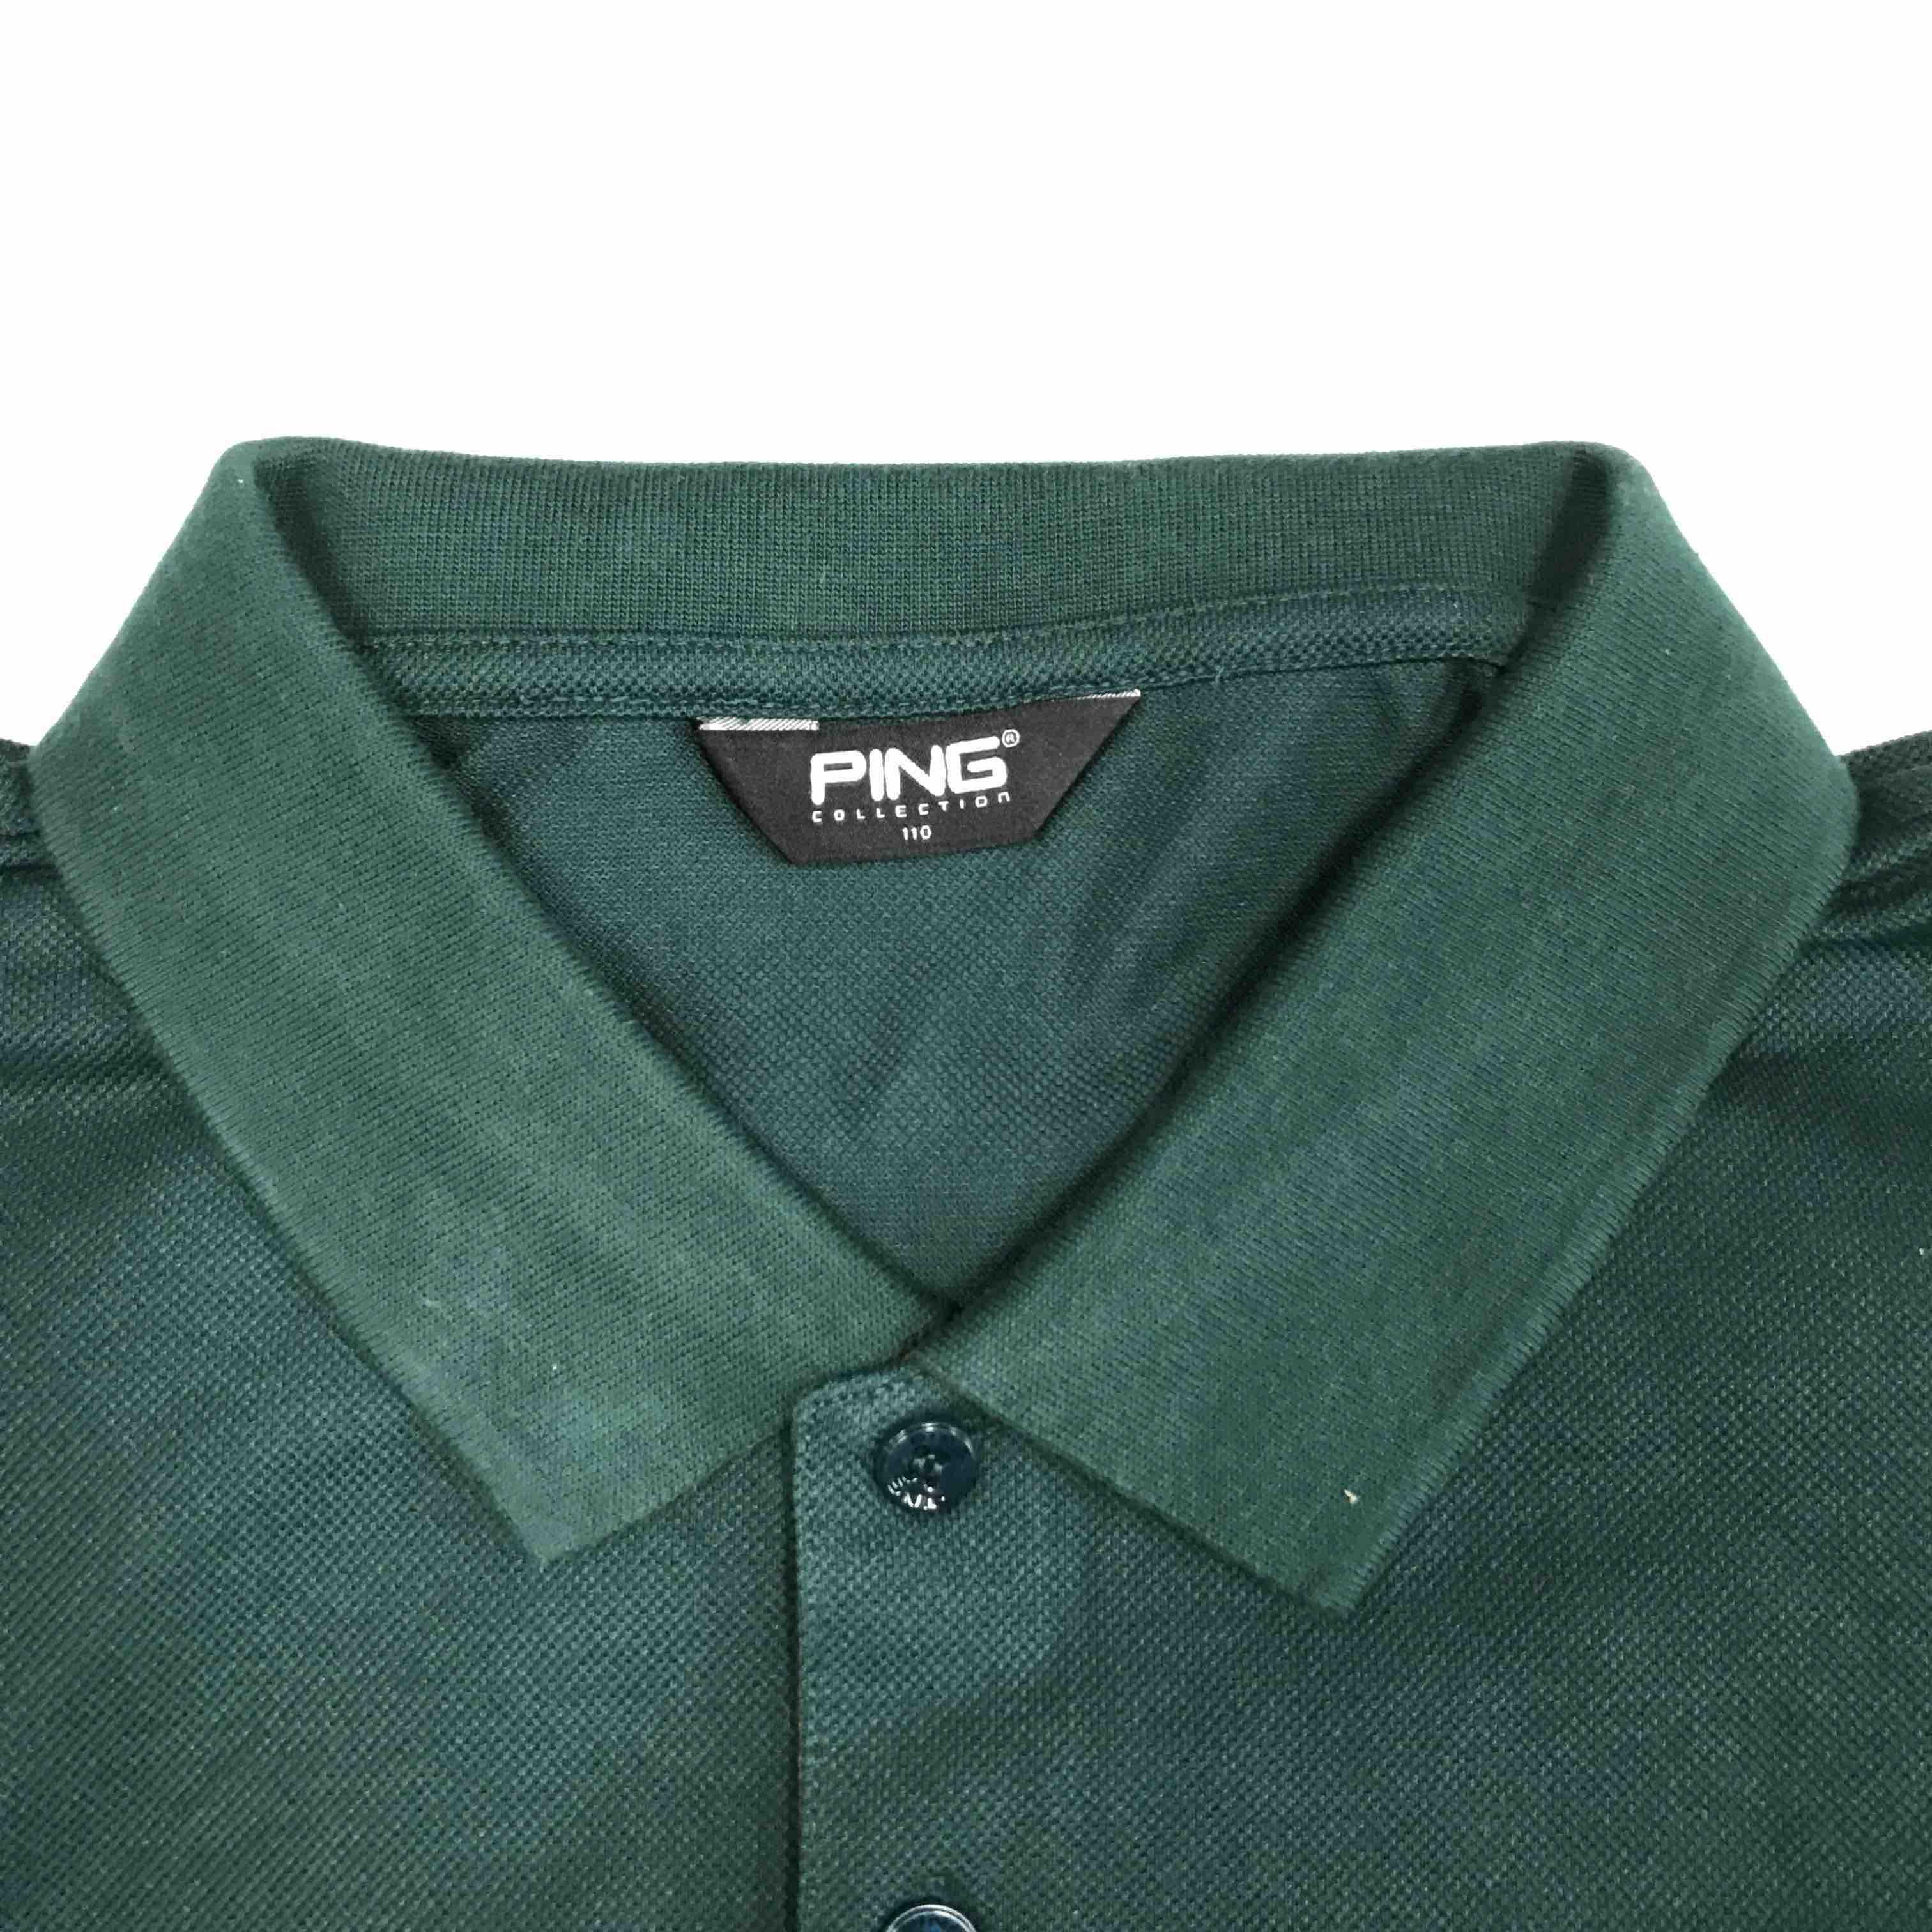 199ping 高尔夫服装 秋冬纯色长袖 高尔夫男装 翻领长袖t恤 golf 六款